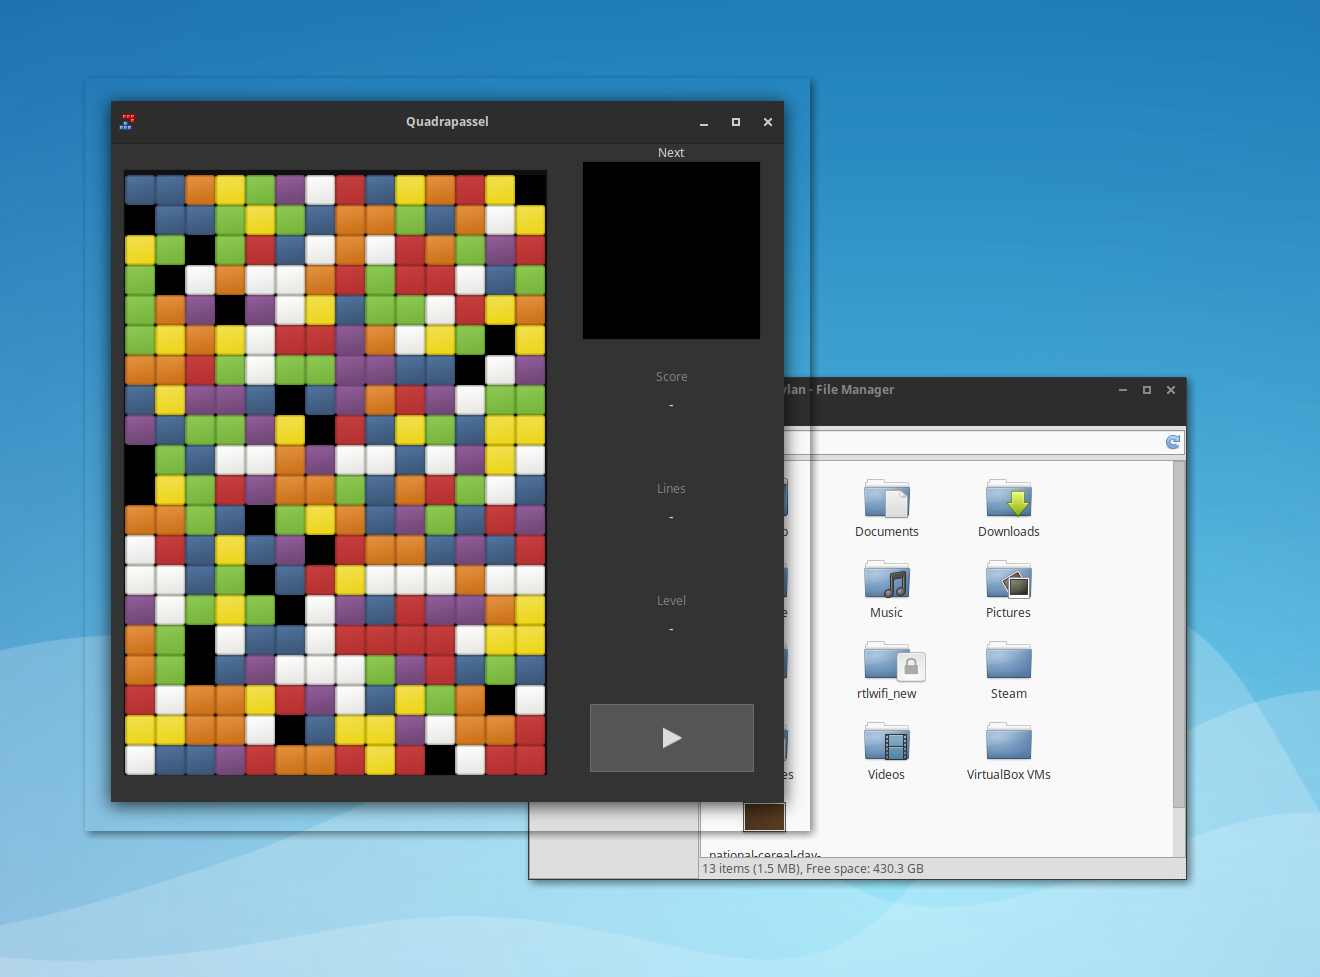 ubuntu 16.10 new document